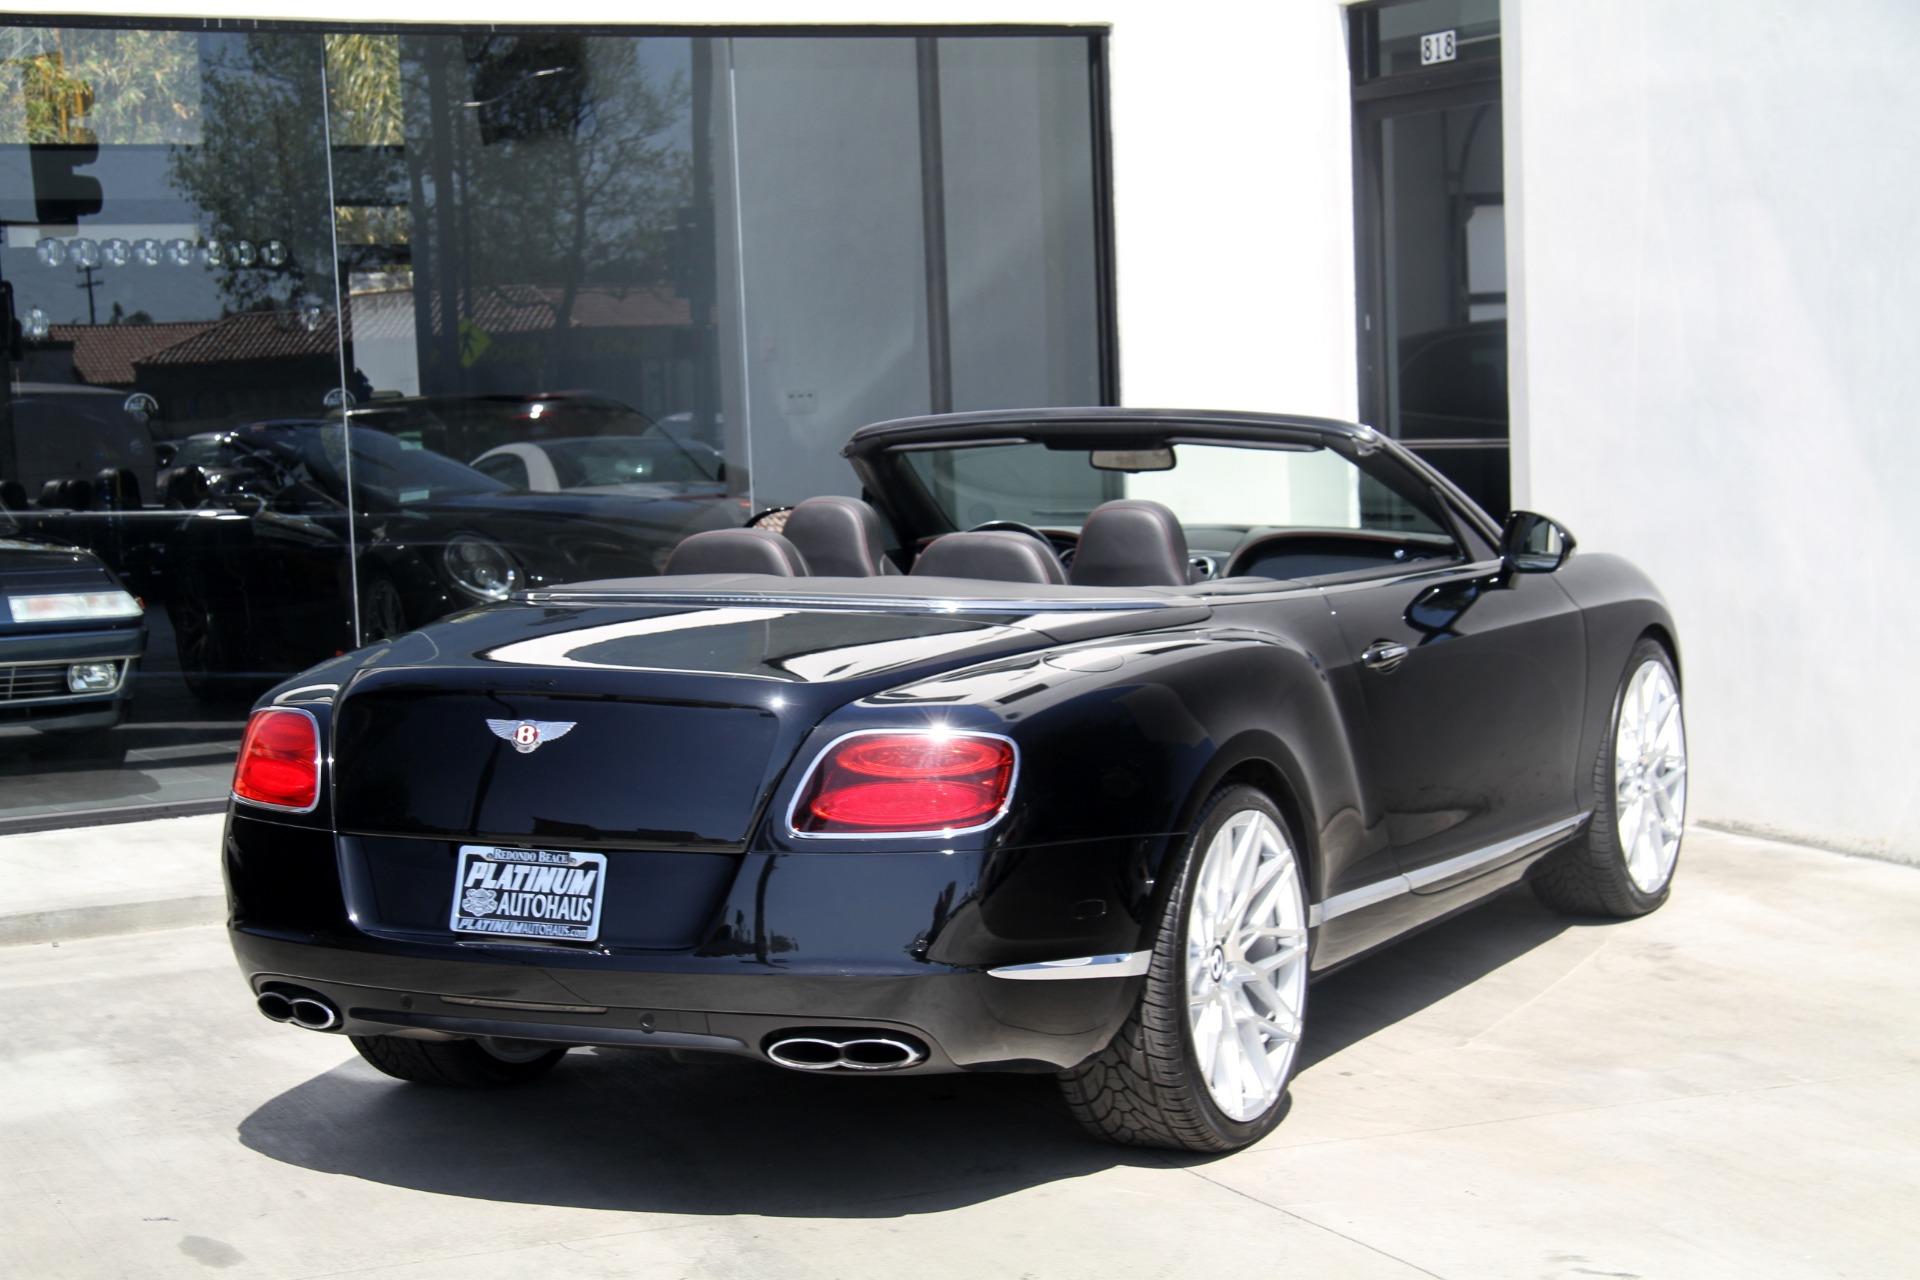 2013 Bentley Continental GTC V8 Stock # 6131 for sale near Redondo ...